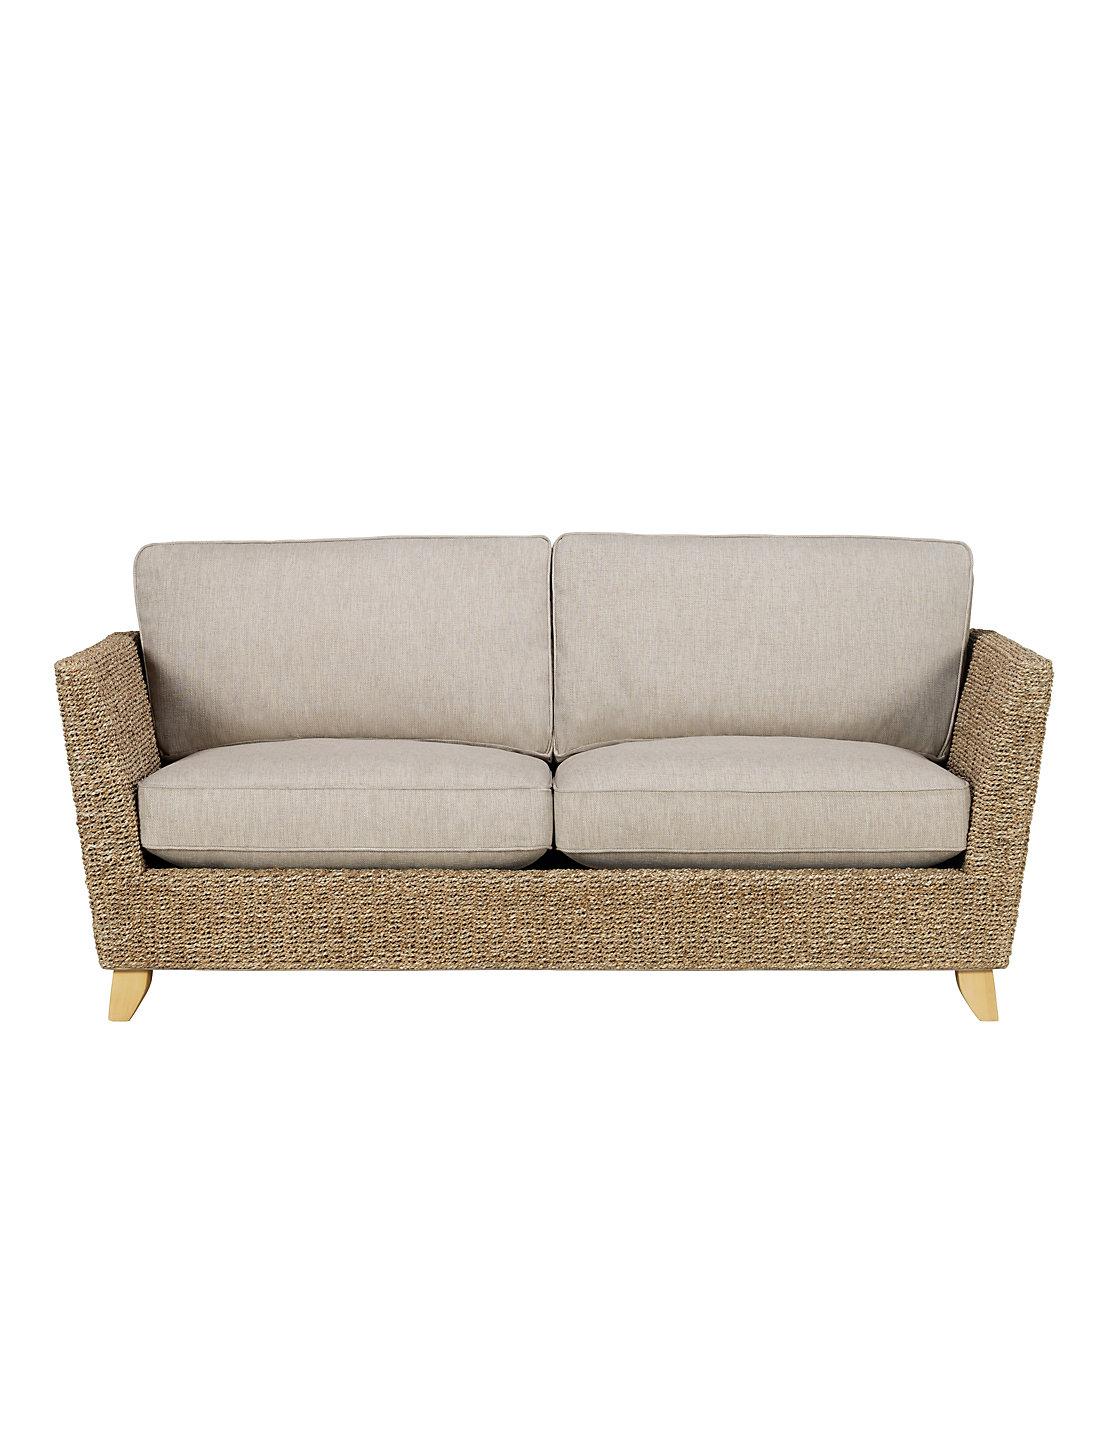 Medium Sofa Tetrad Harris Tweed Gleneagles